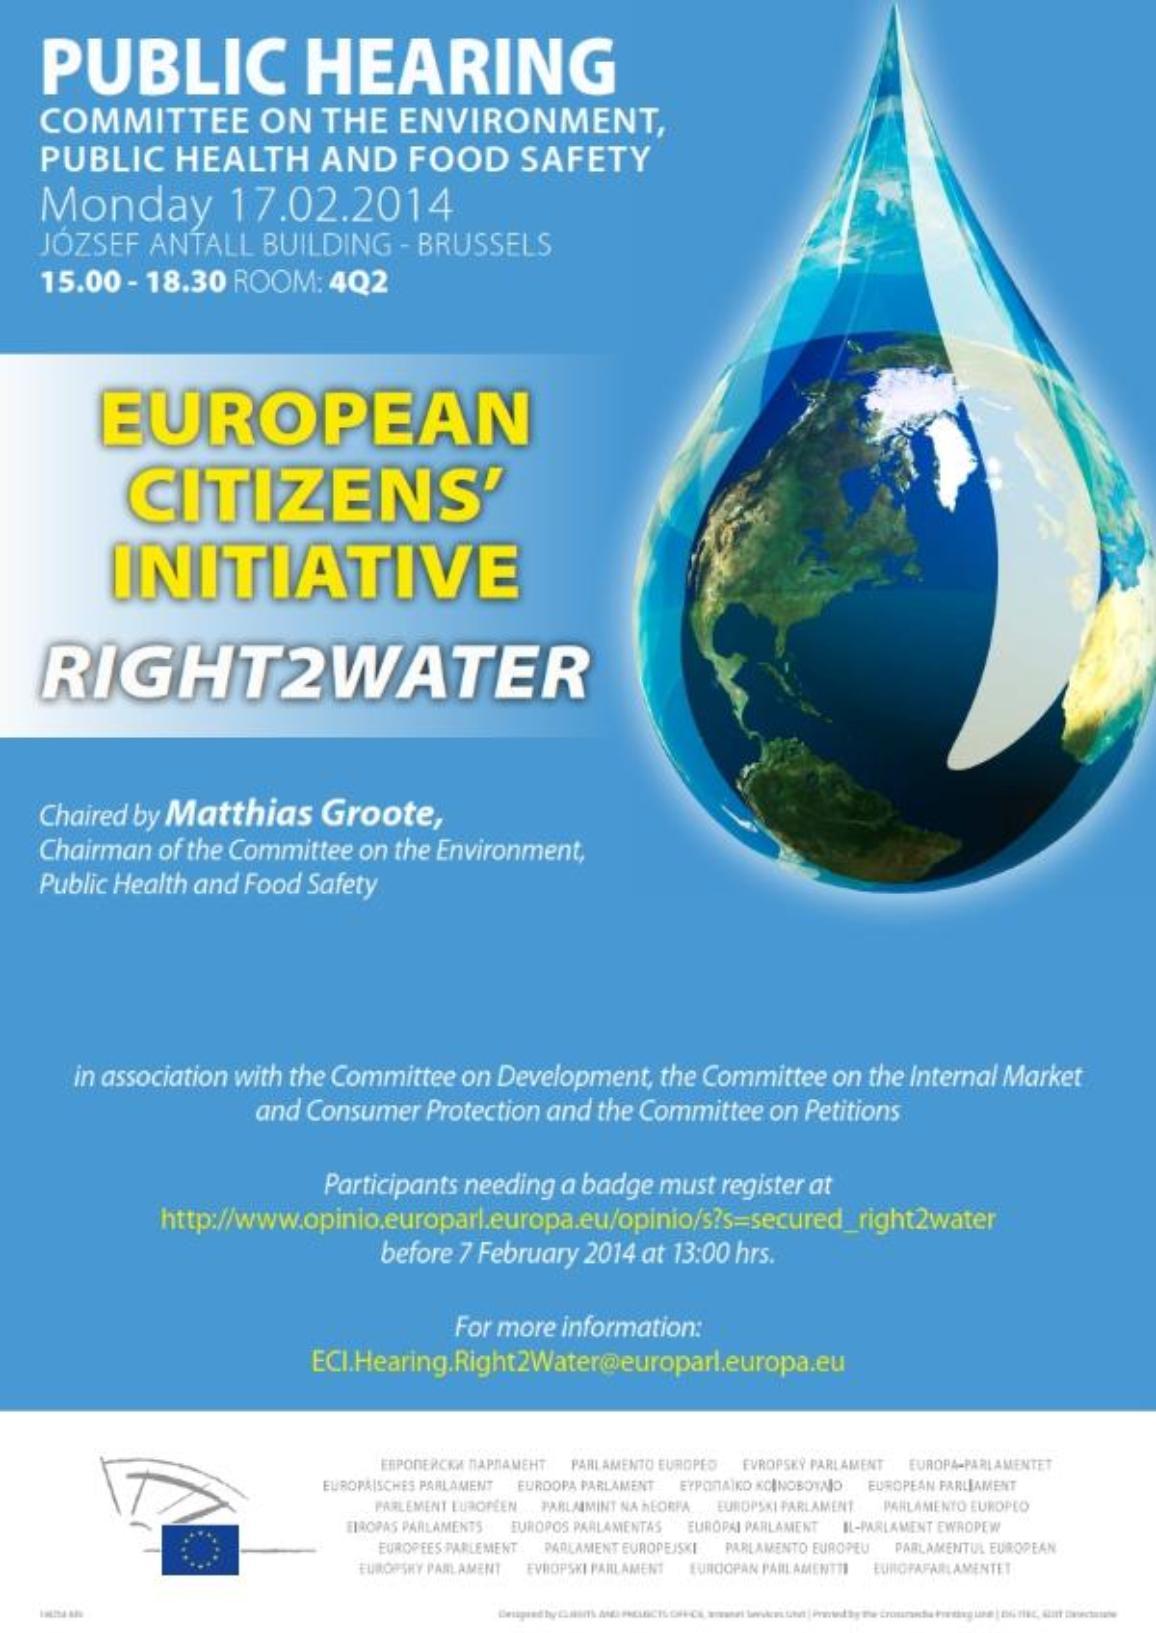 Public Hearing - European Citizens' Initiative: Right 2 water